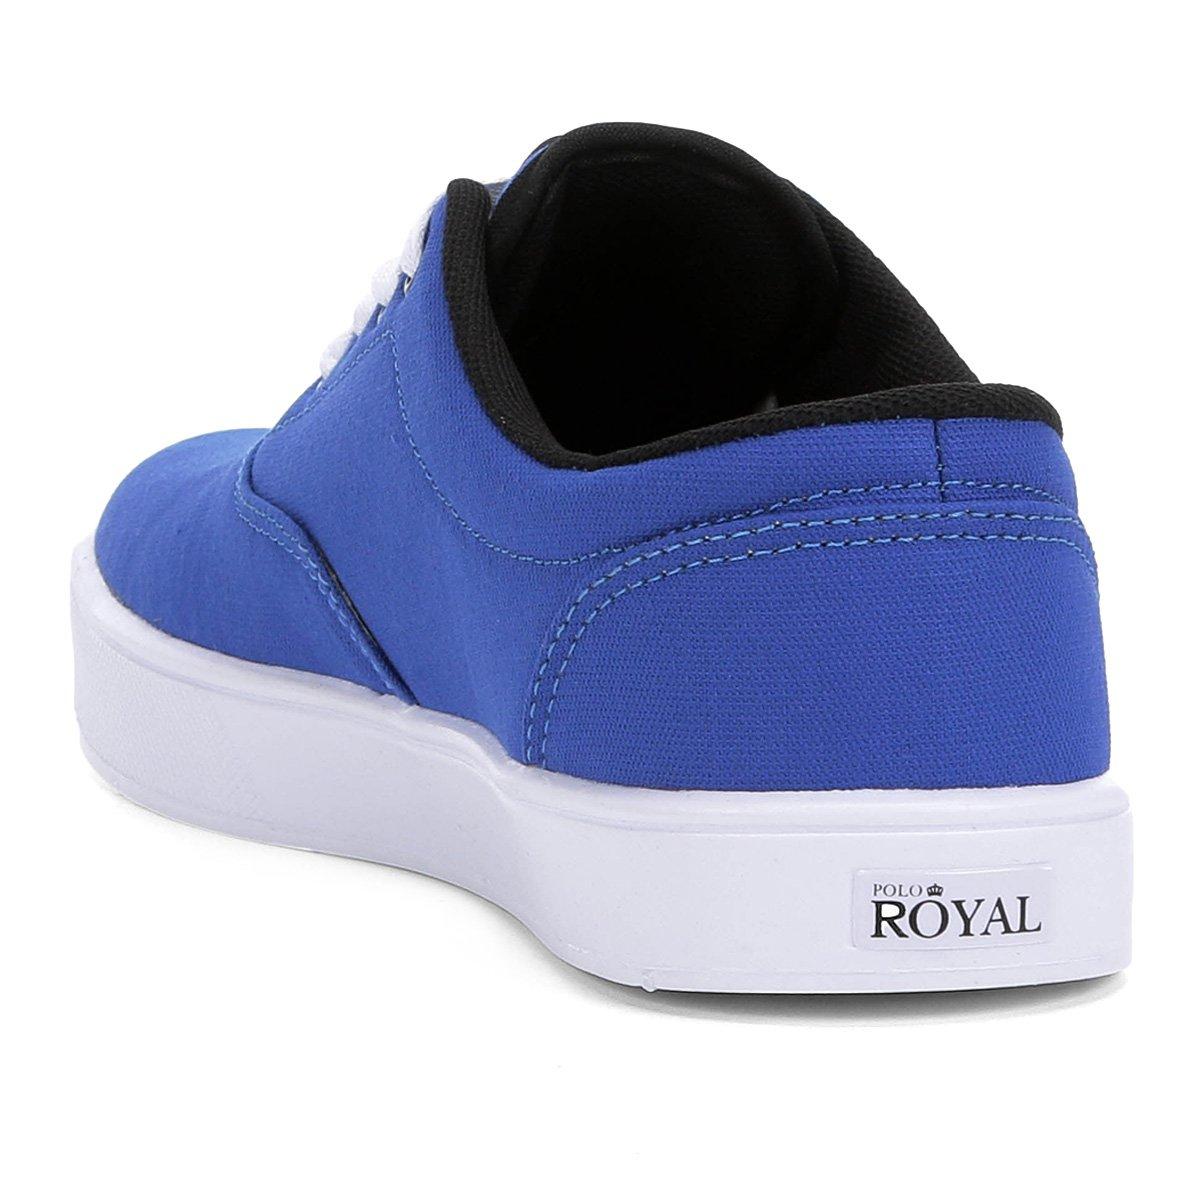 Lona Montecar Royal Royal Tênis Azul Masculino Tênis Polo Polo xAqgUXc